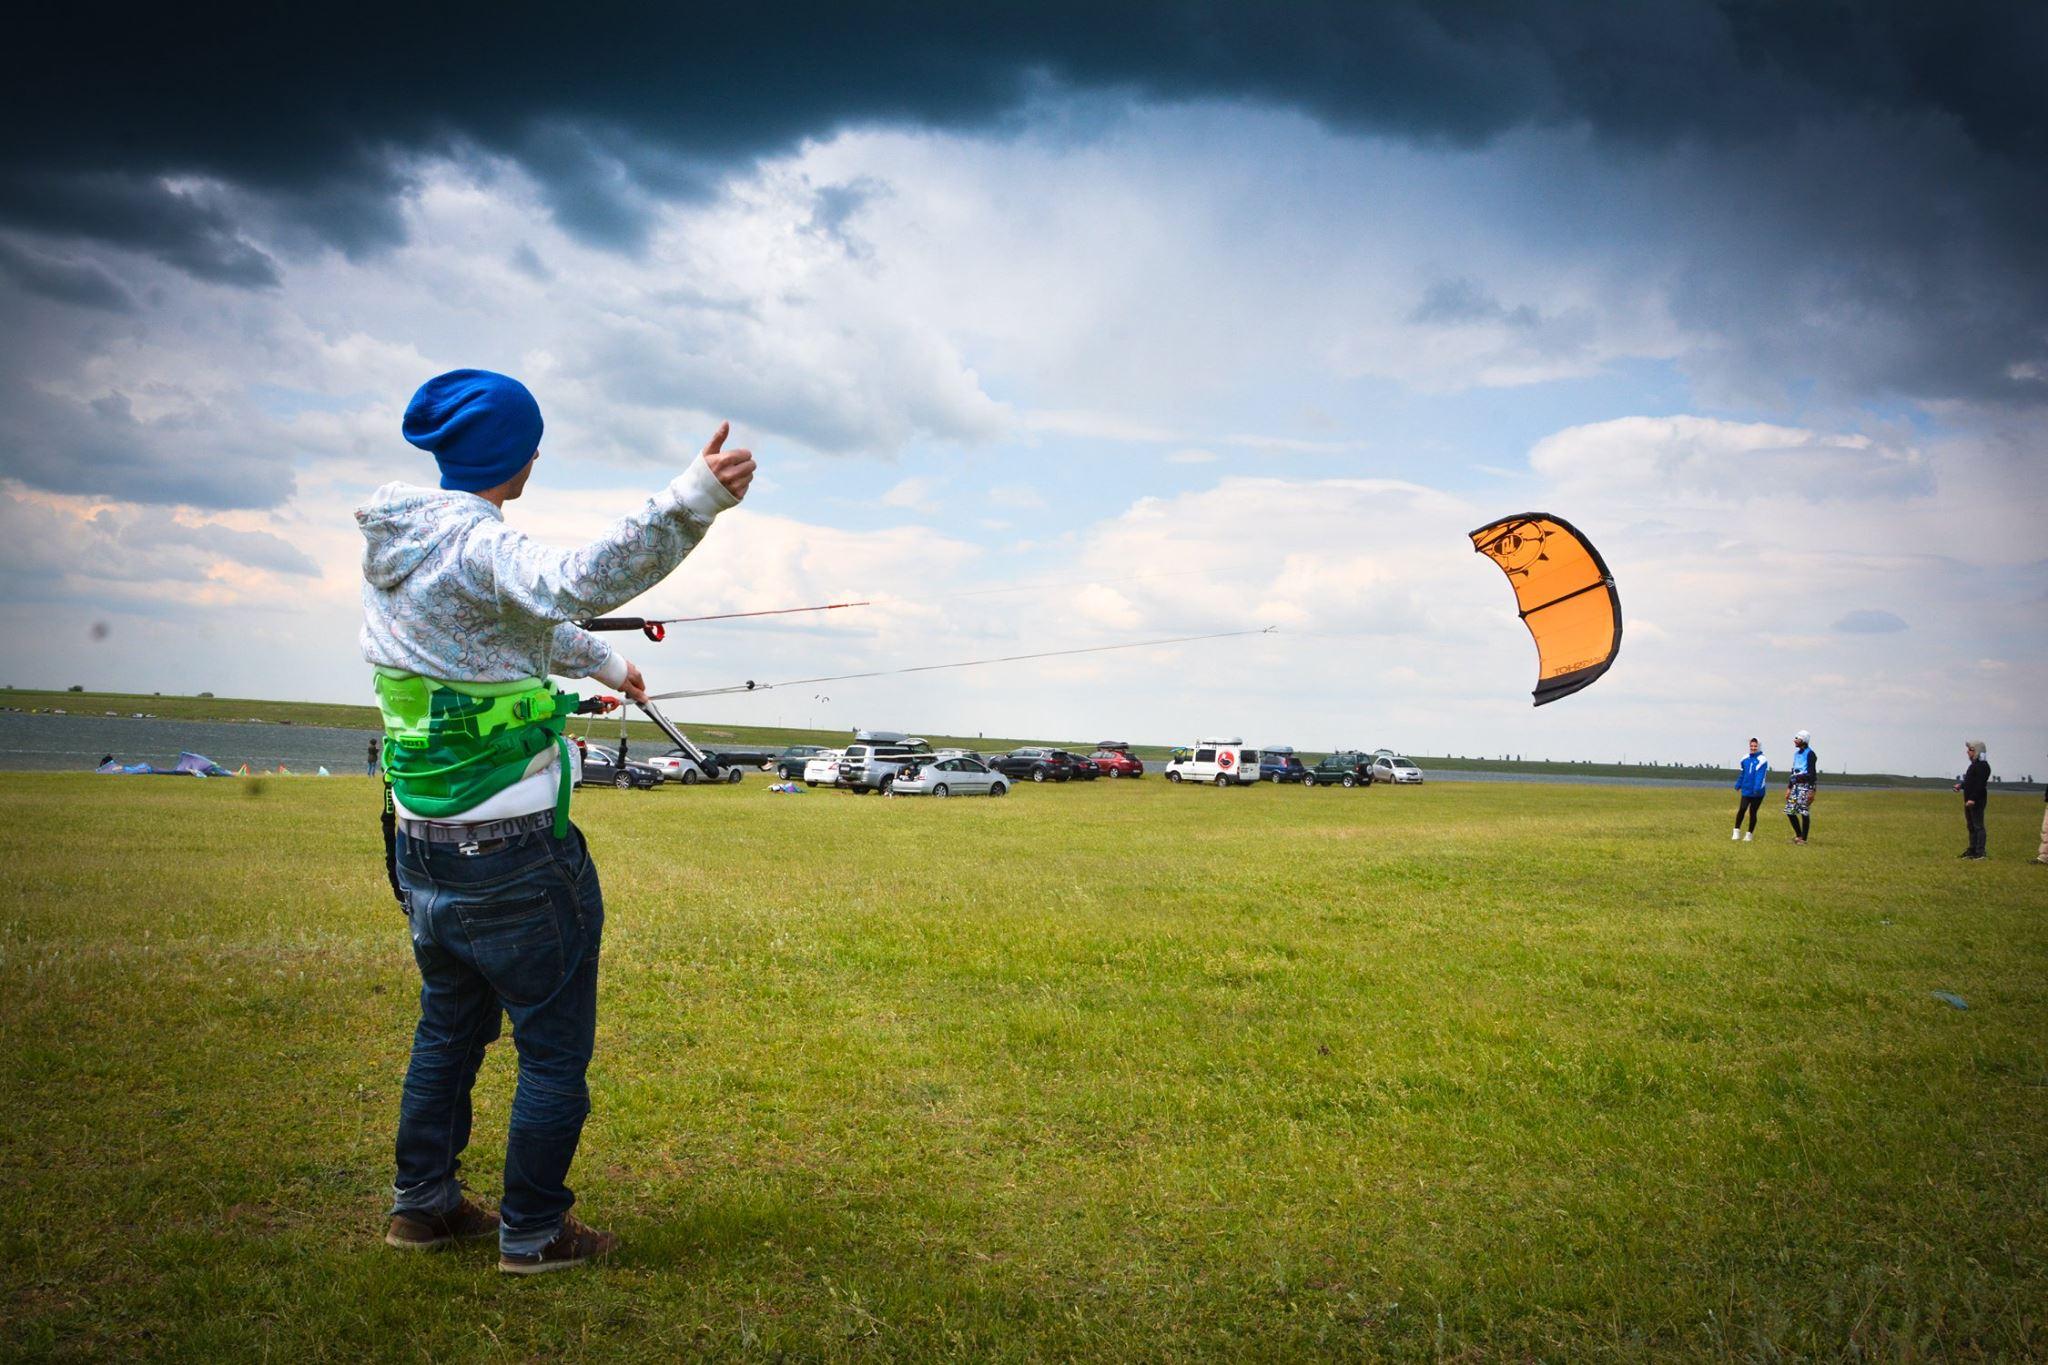 kite fresh kiters day 2017 fundata set 1 (9)